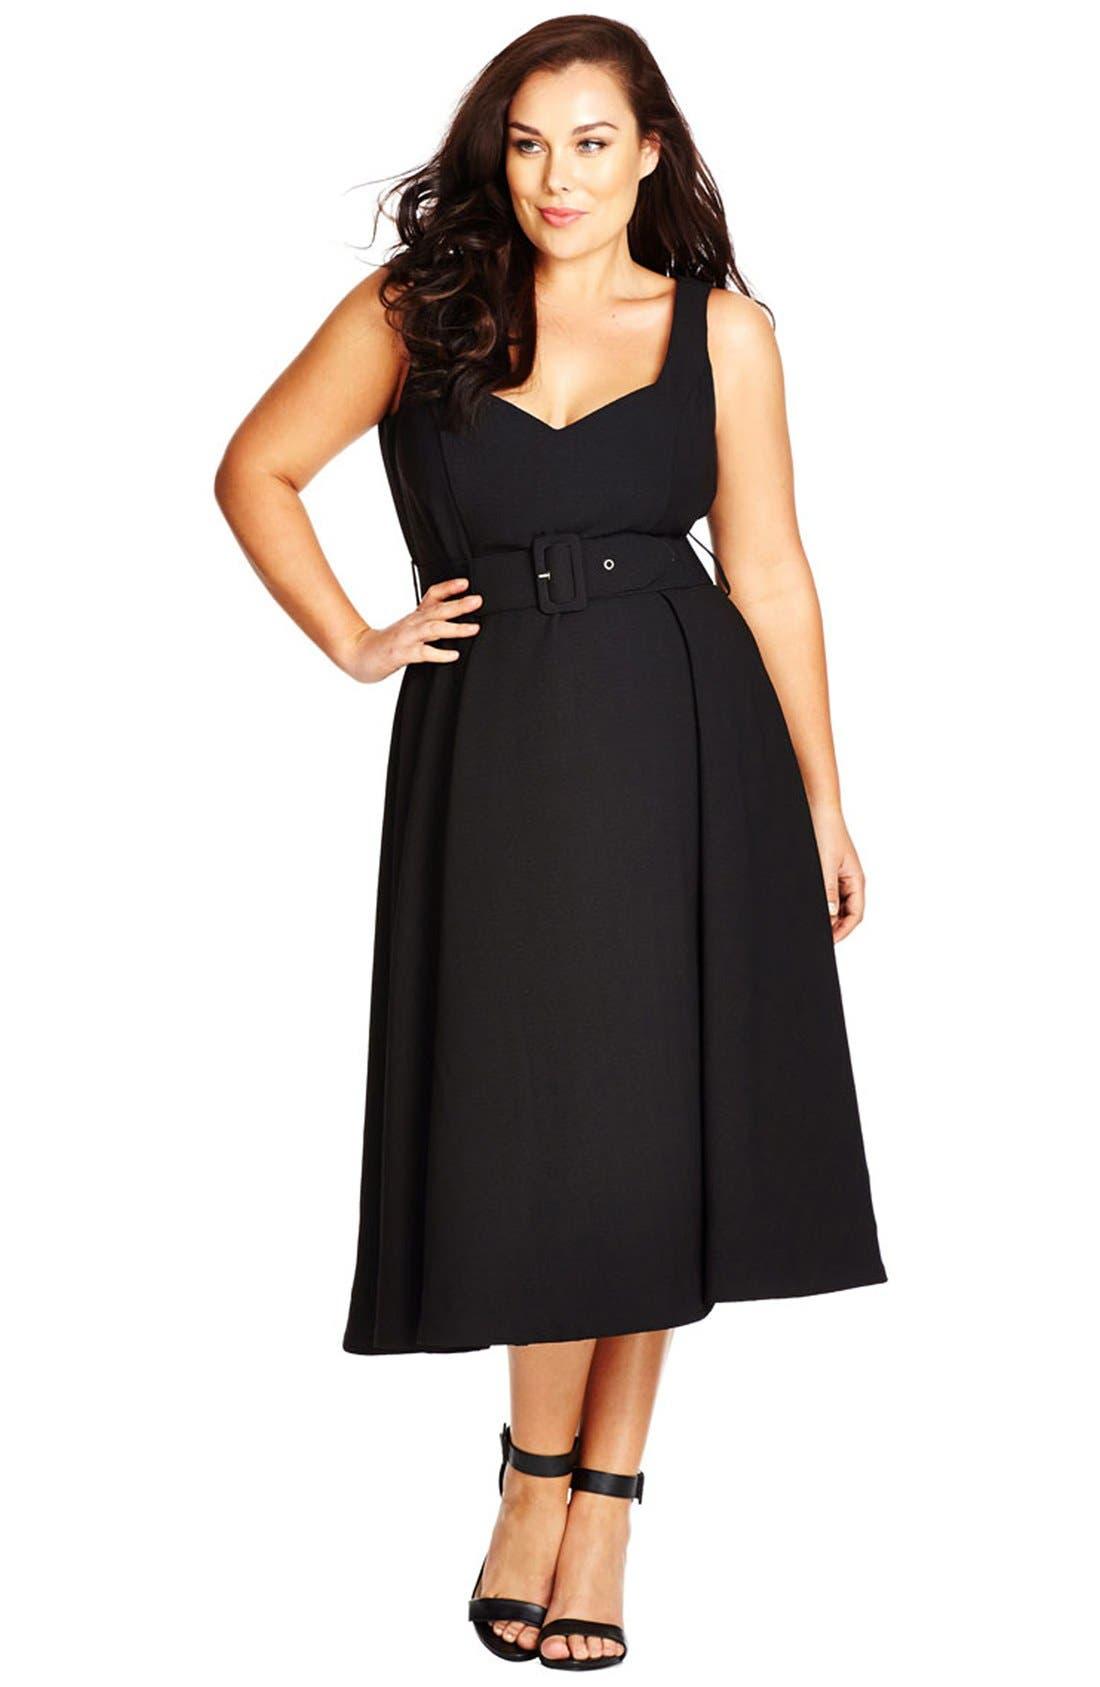 Belted Sweetheart Neck Tea Length Dress,                             Main thumbnail 1, color,                             001